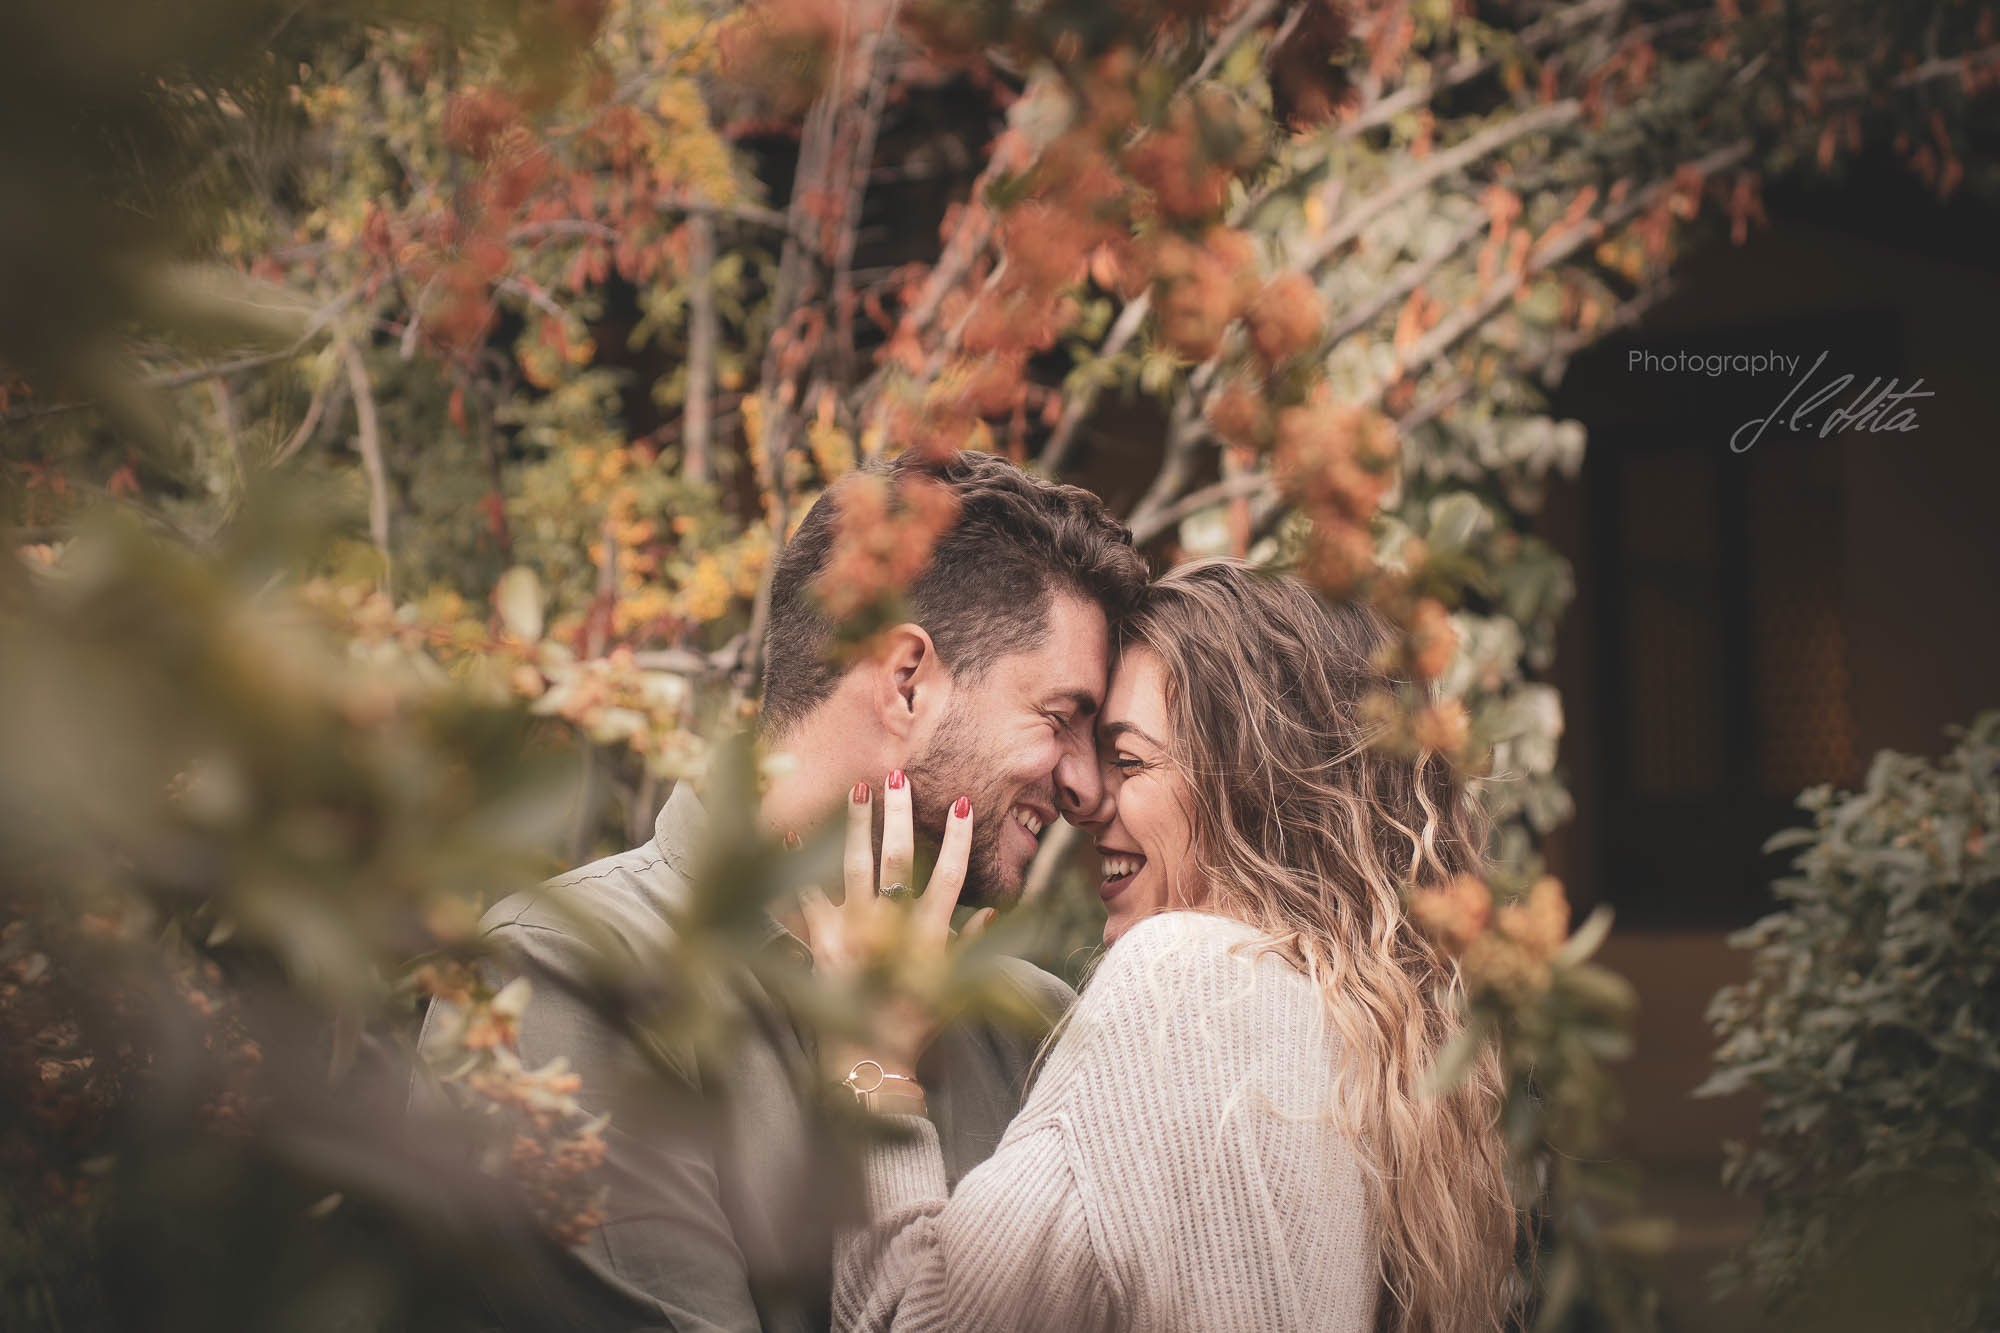 Sesión pareja con encanto